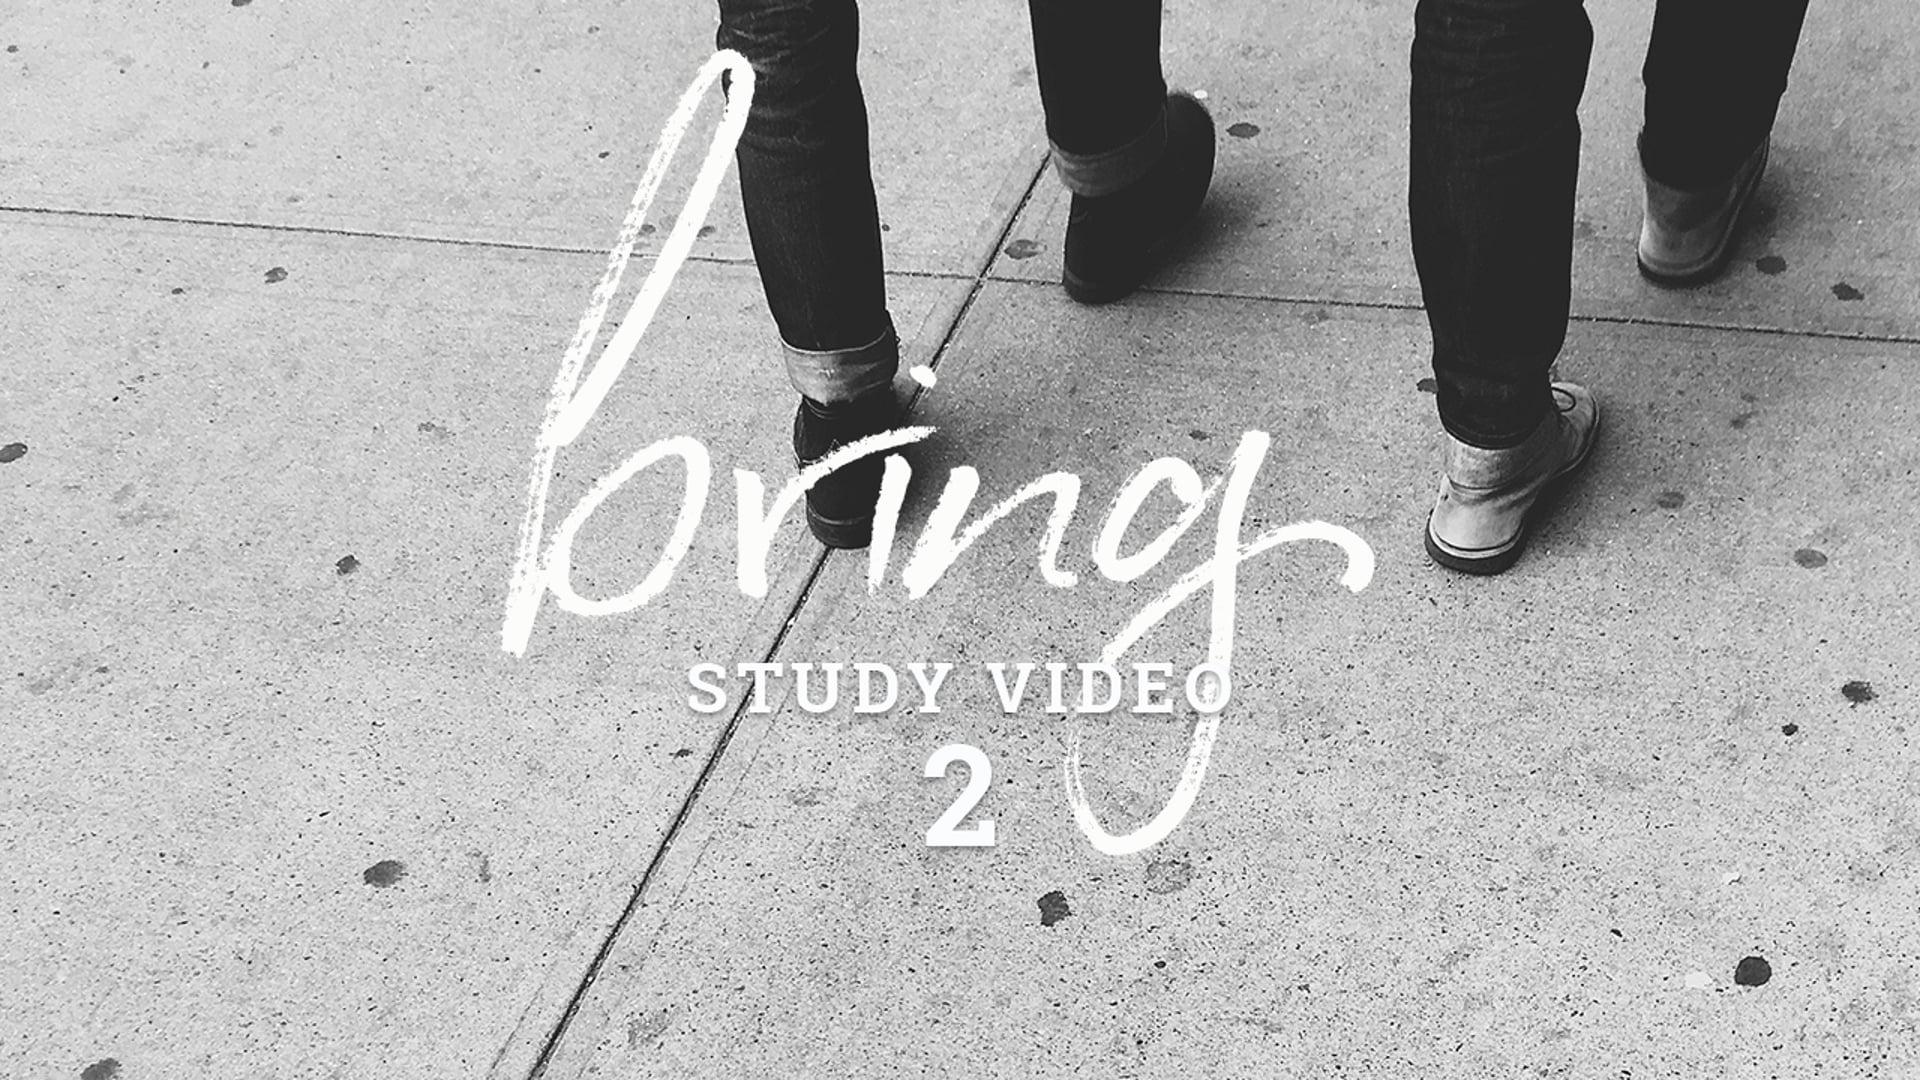 Bring - Study Video 2